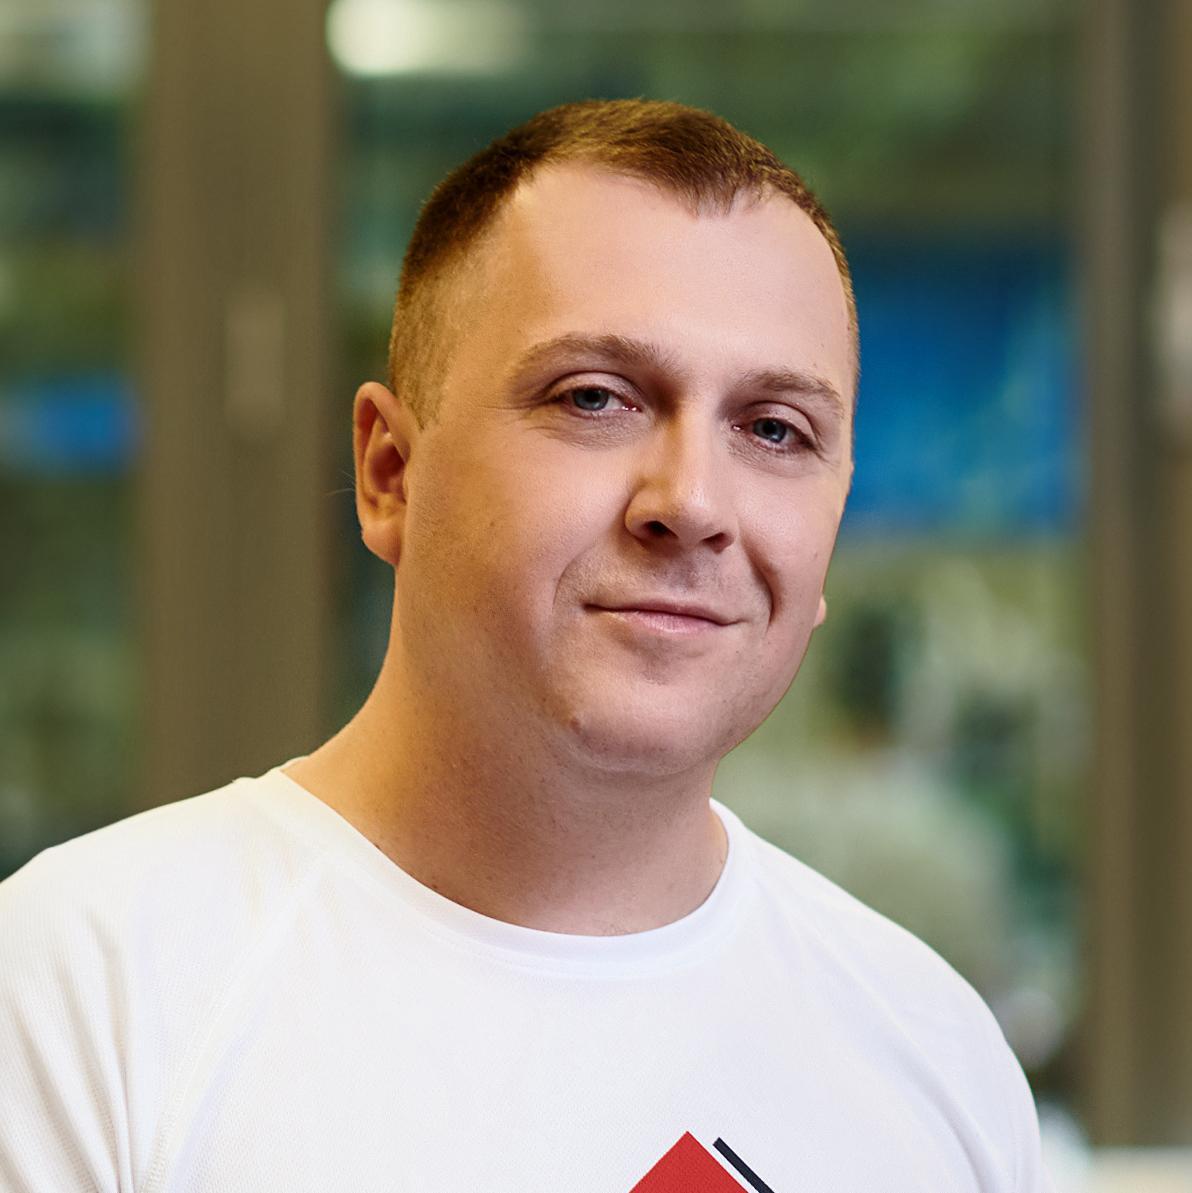 Marcin Janiszek